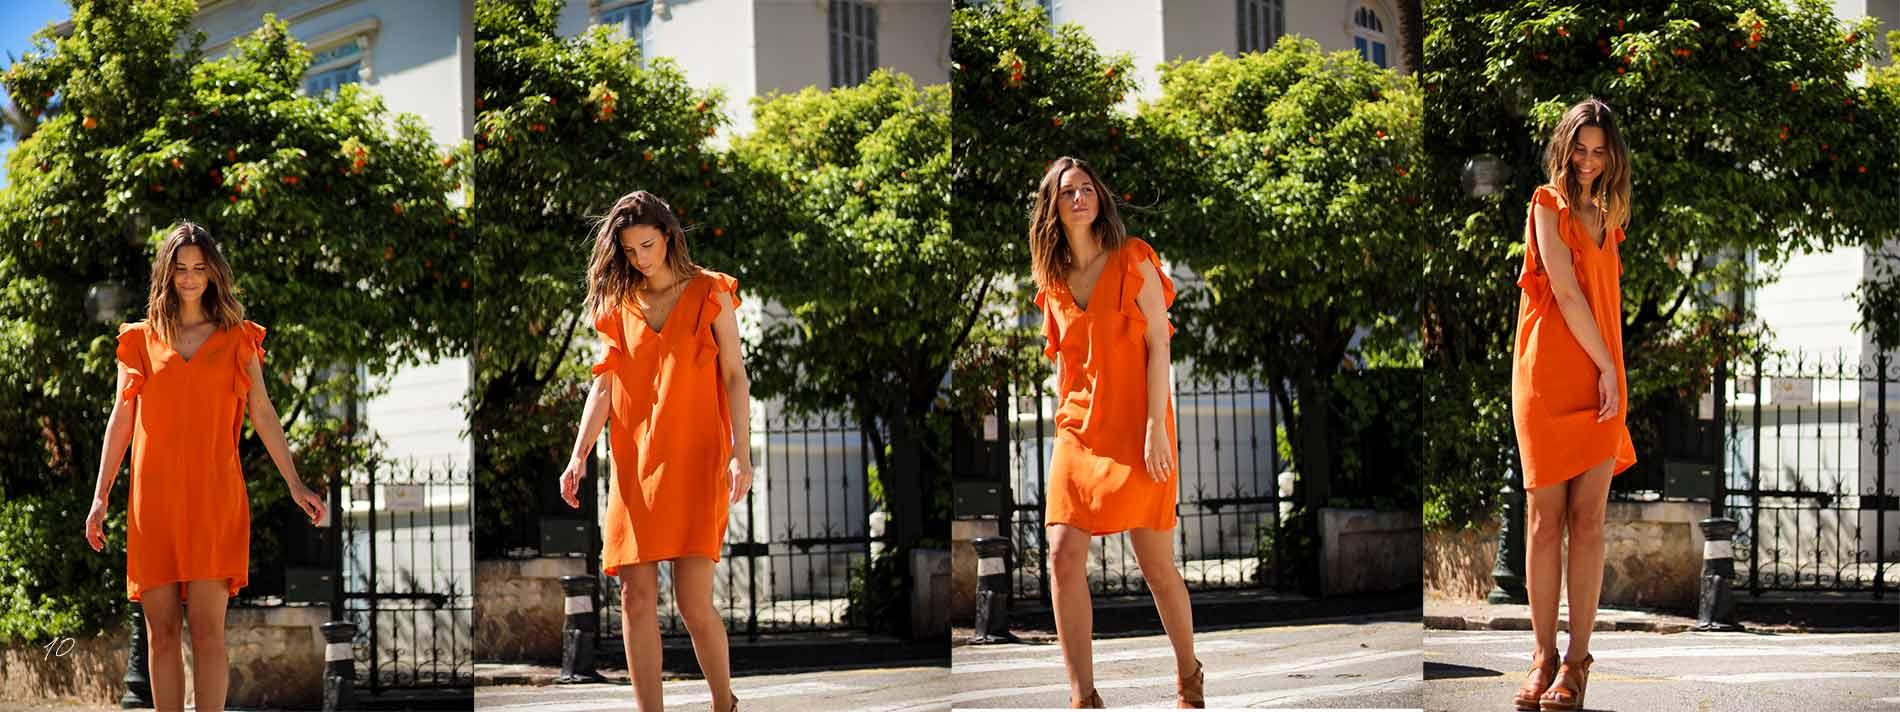 Robe Pour Mariage Invite Tenue Habillee Edition Limitee Atode